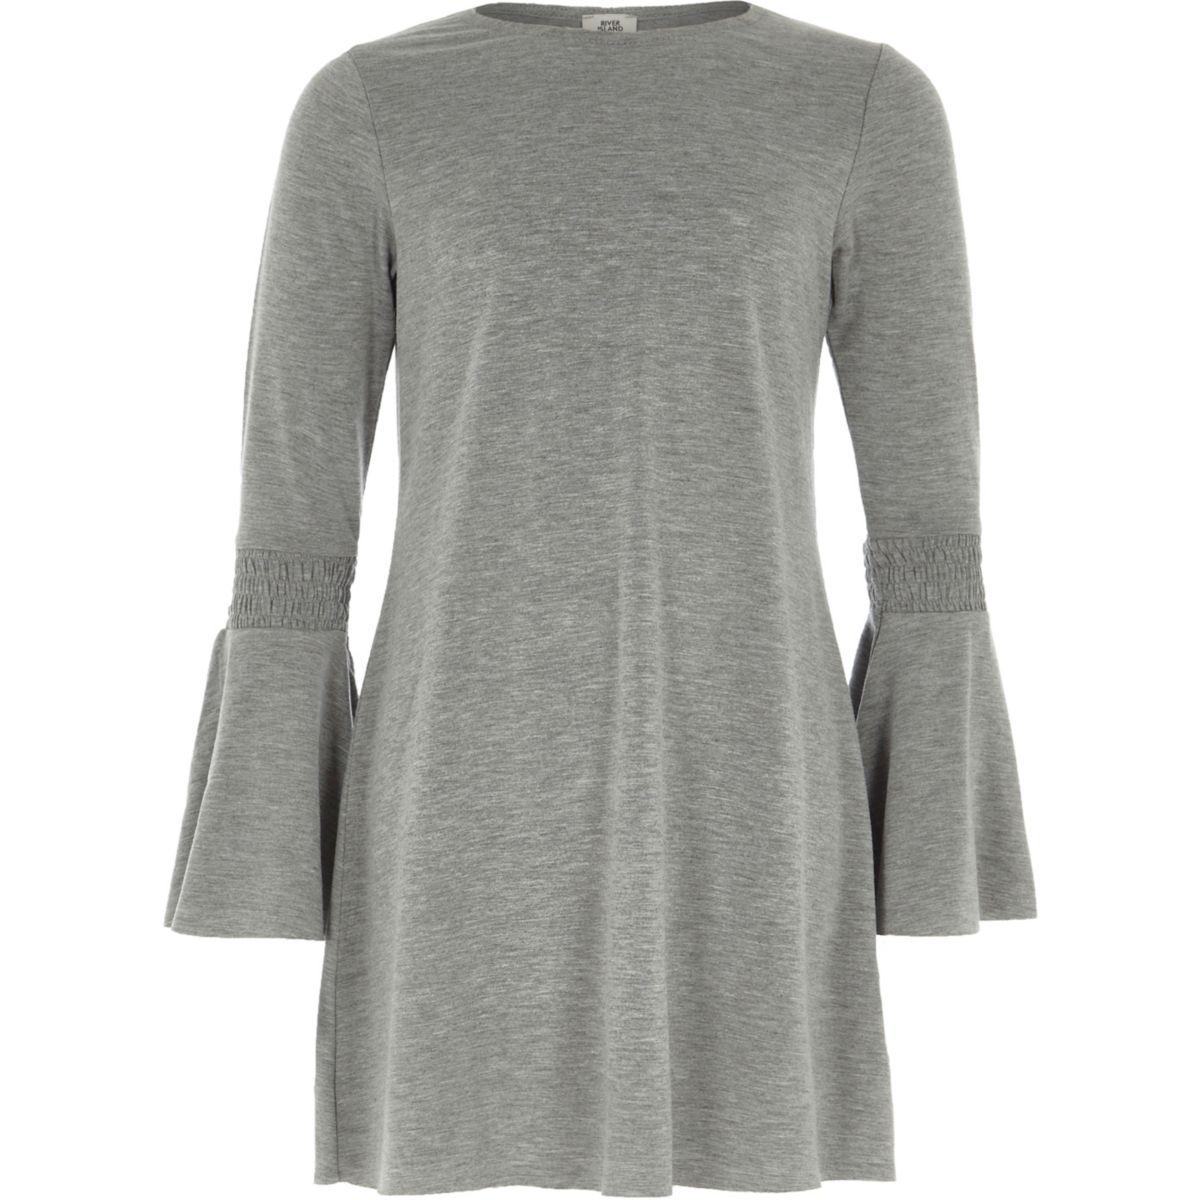 Girls grey marl flare sleeve swing dress